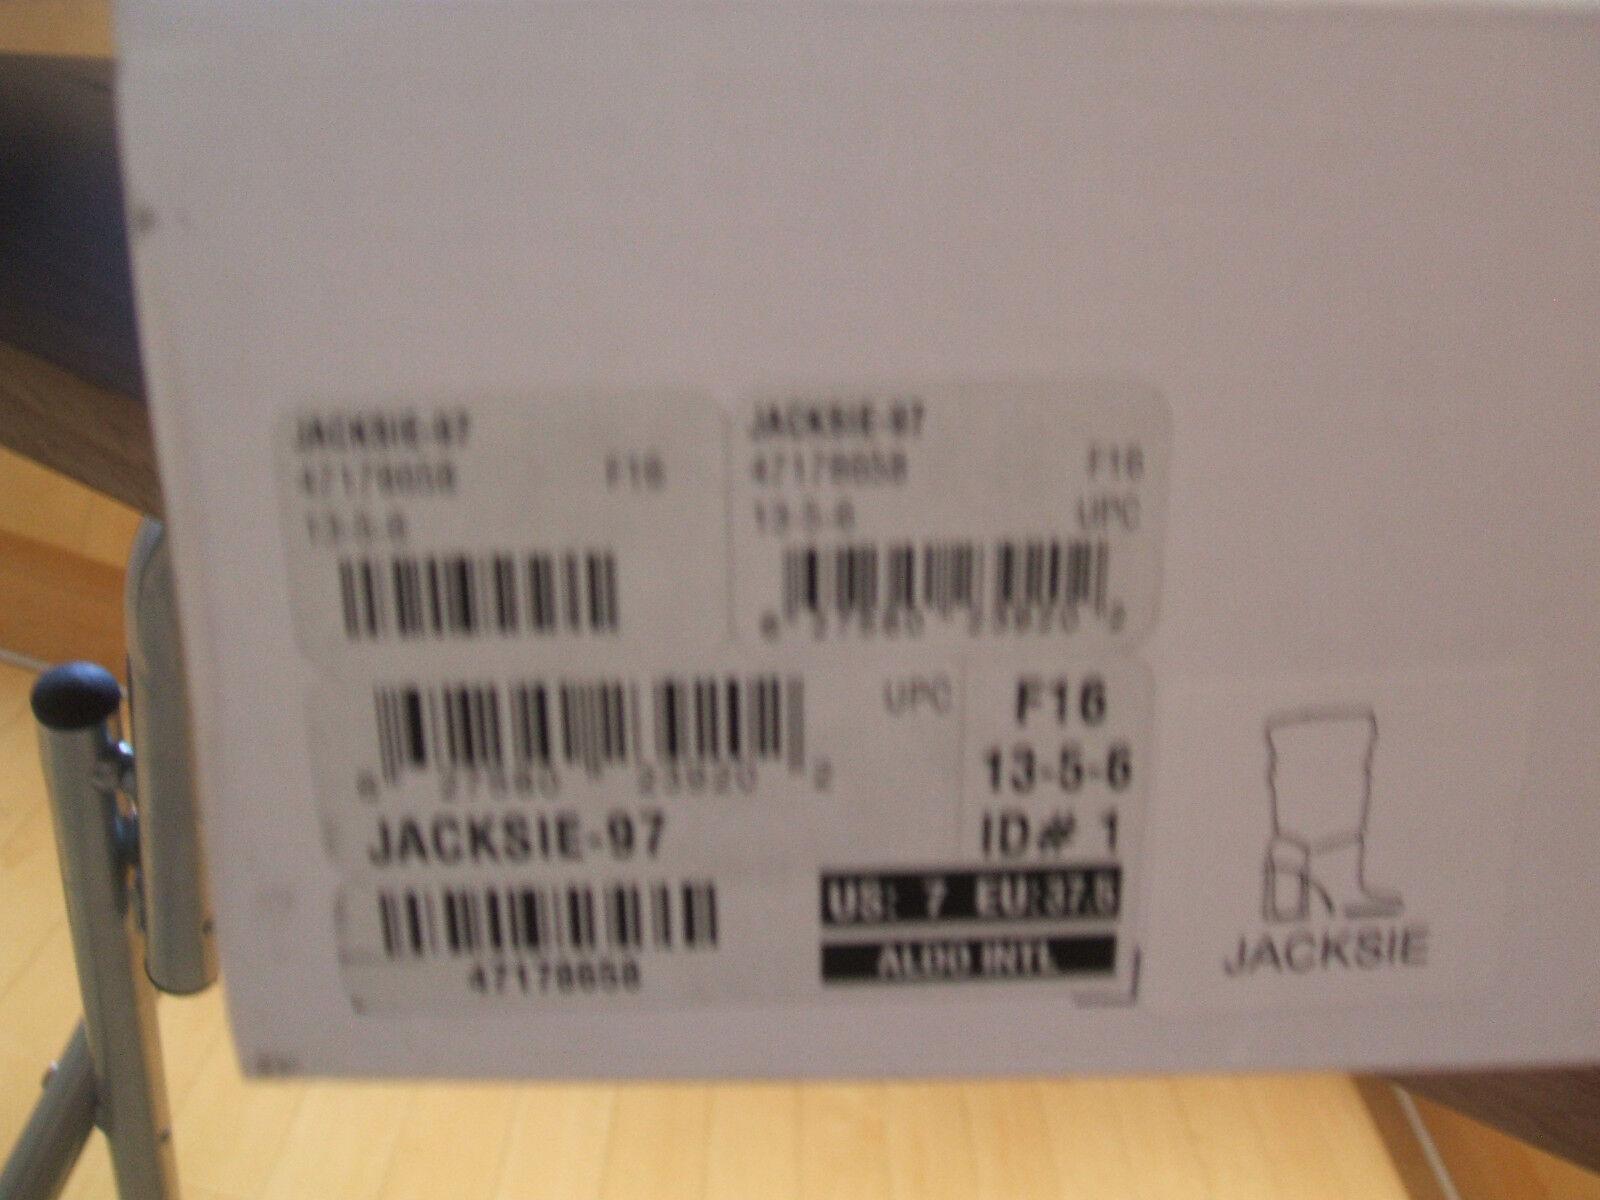 ALDO Größe 4.5 37.5 JACKSIE schwarz REAL LEATHER LEATHER LEATHER CALF KNEE HIGH Stiefel BNWB 2e4aa3